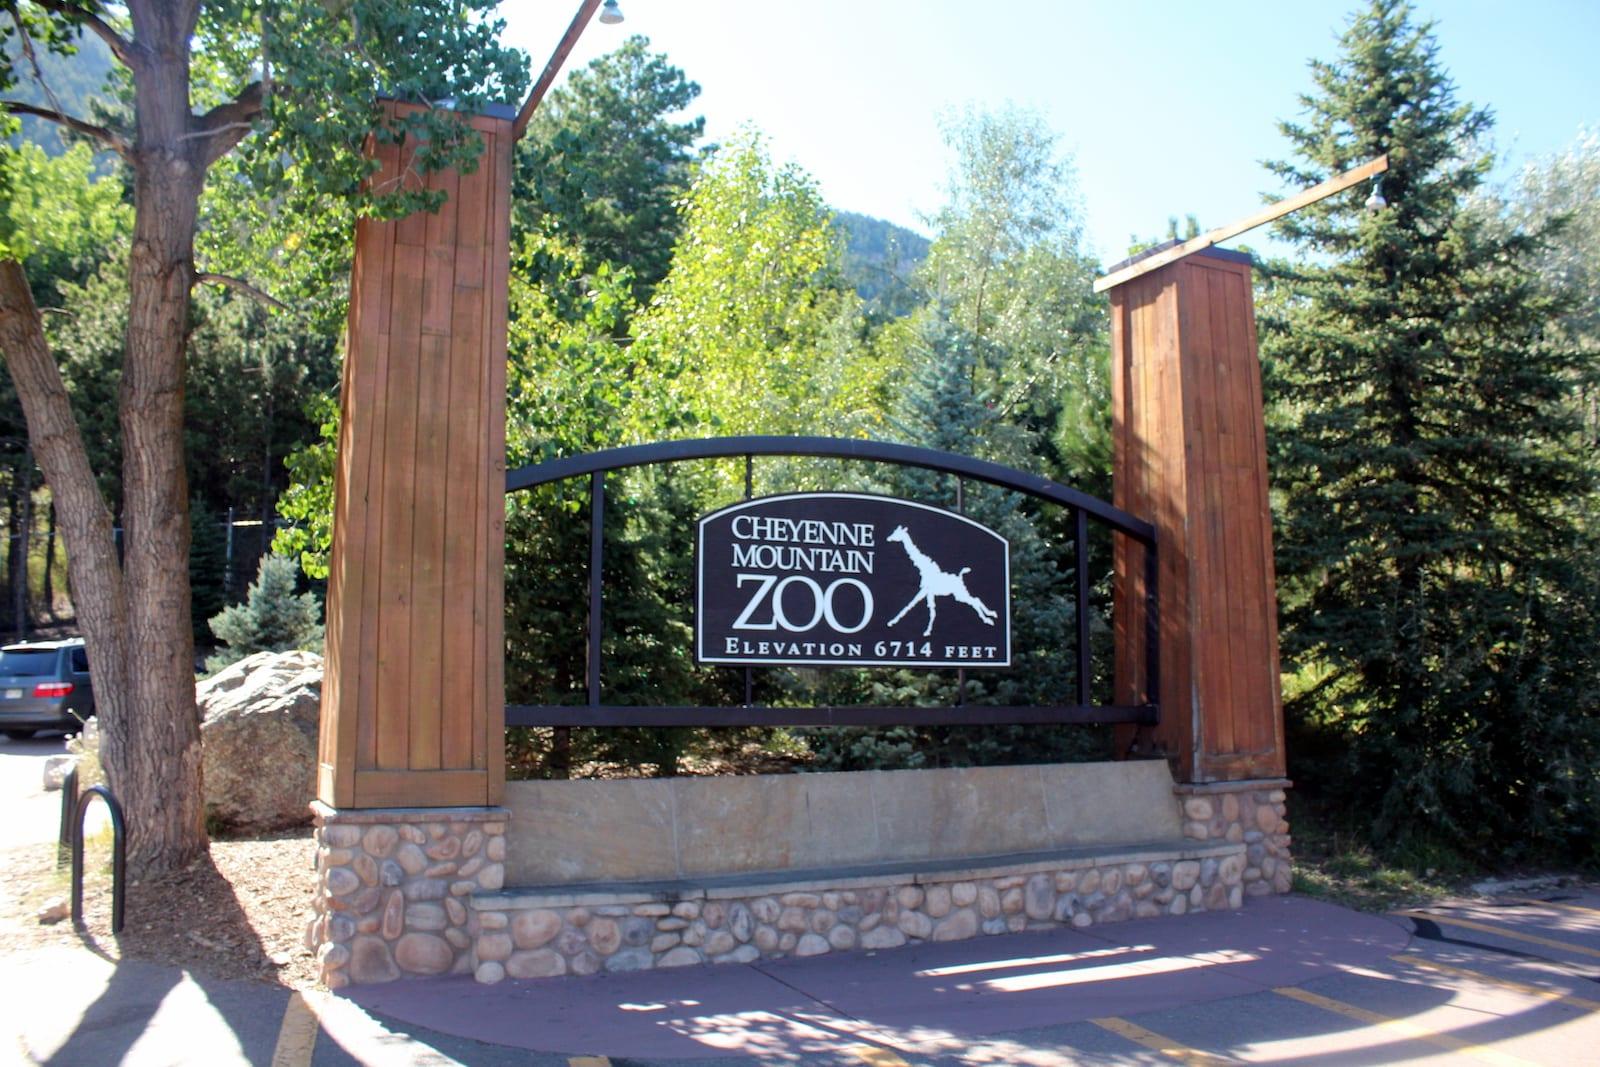 Cheyenne Mountain Zoo Entrance Sign